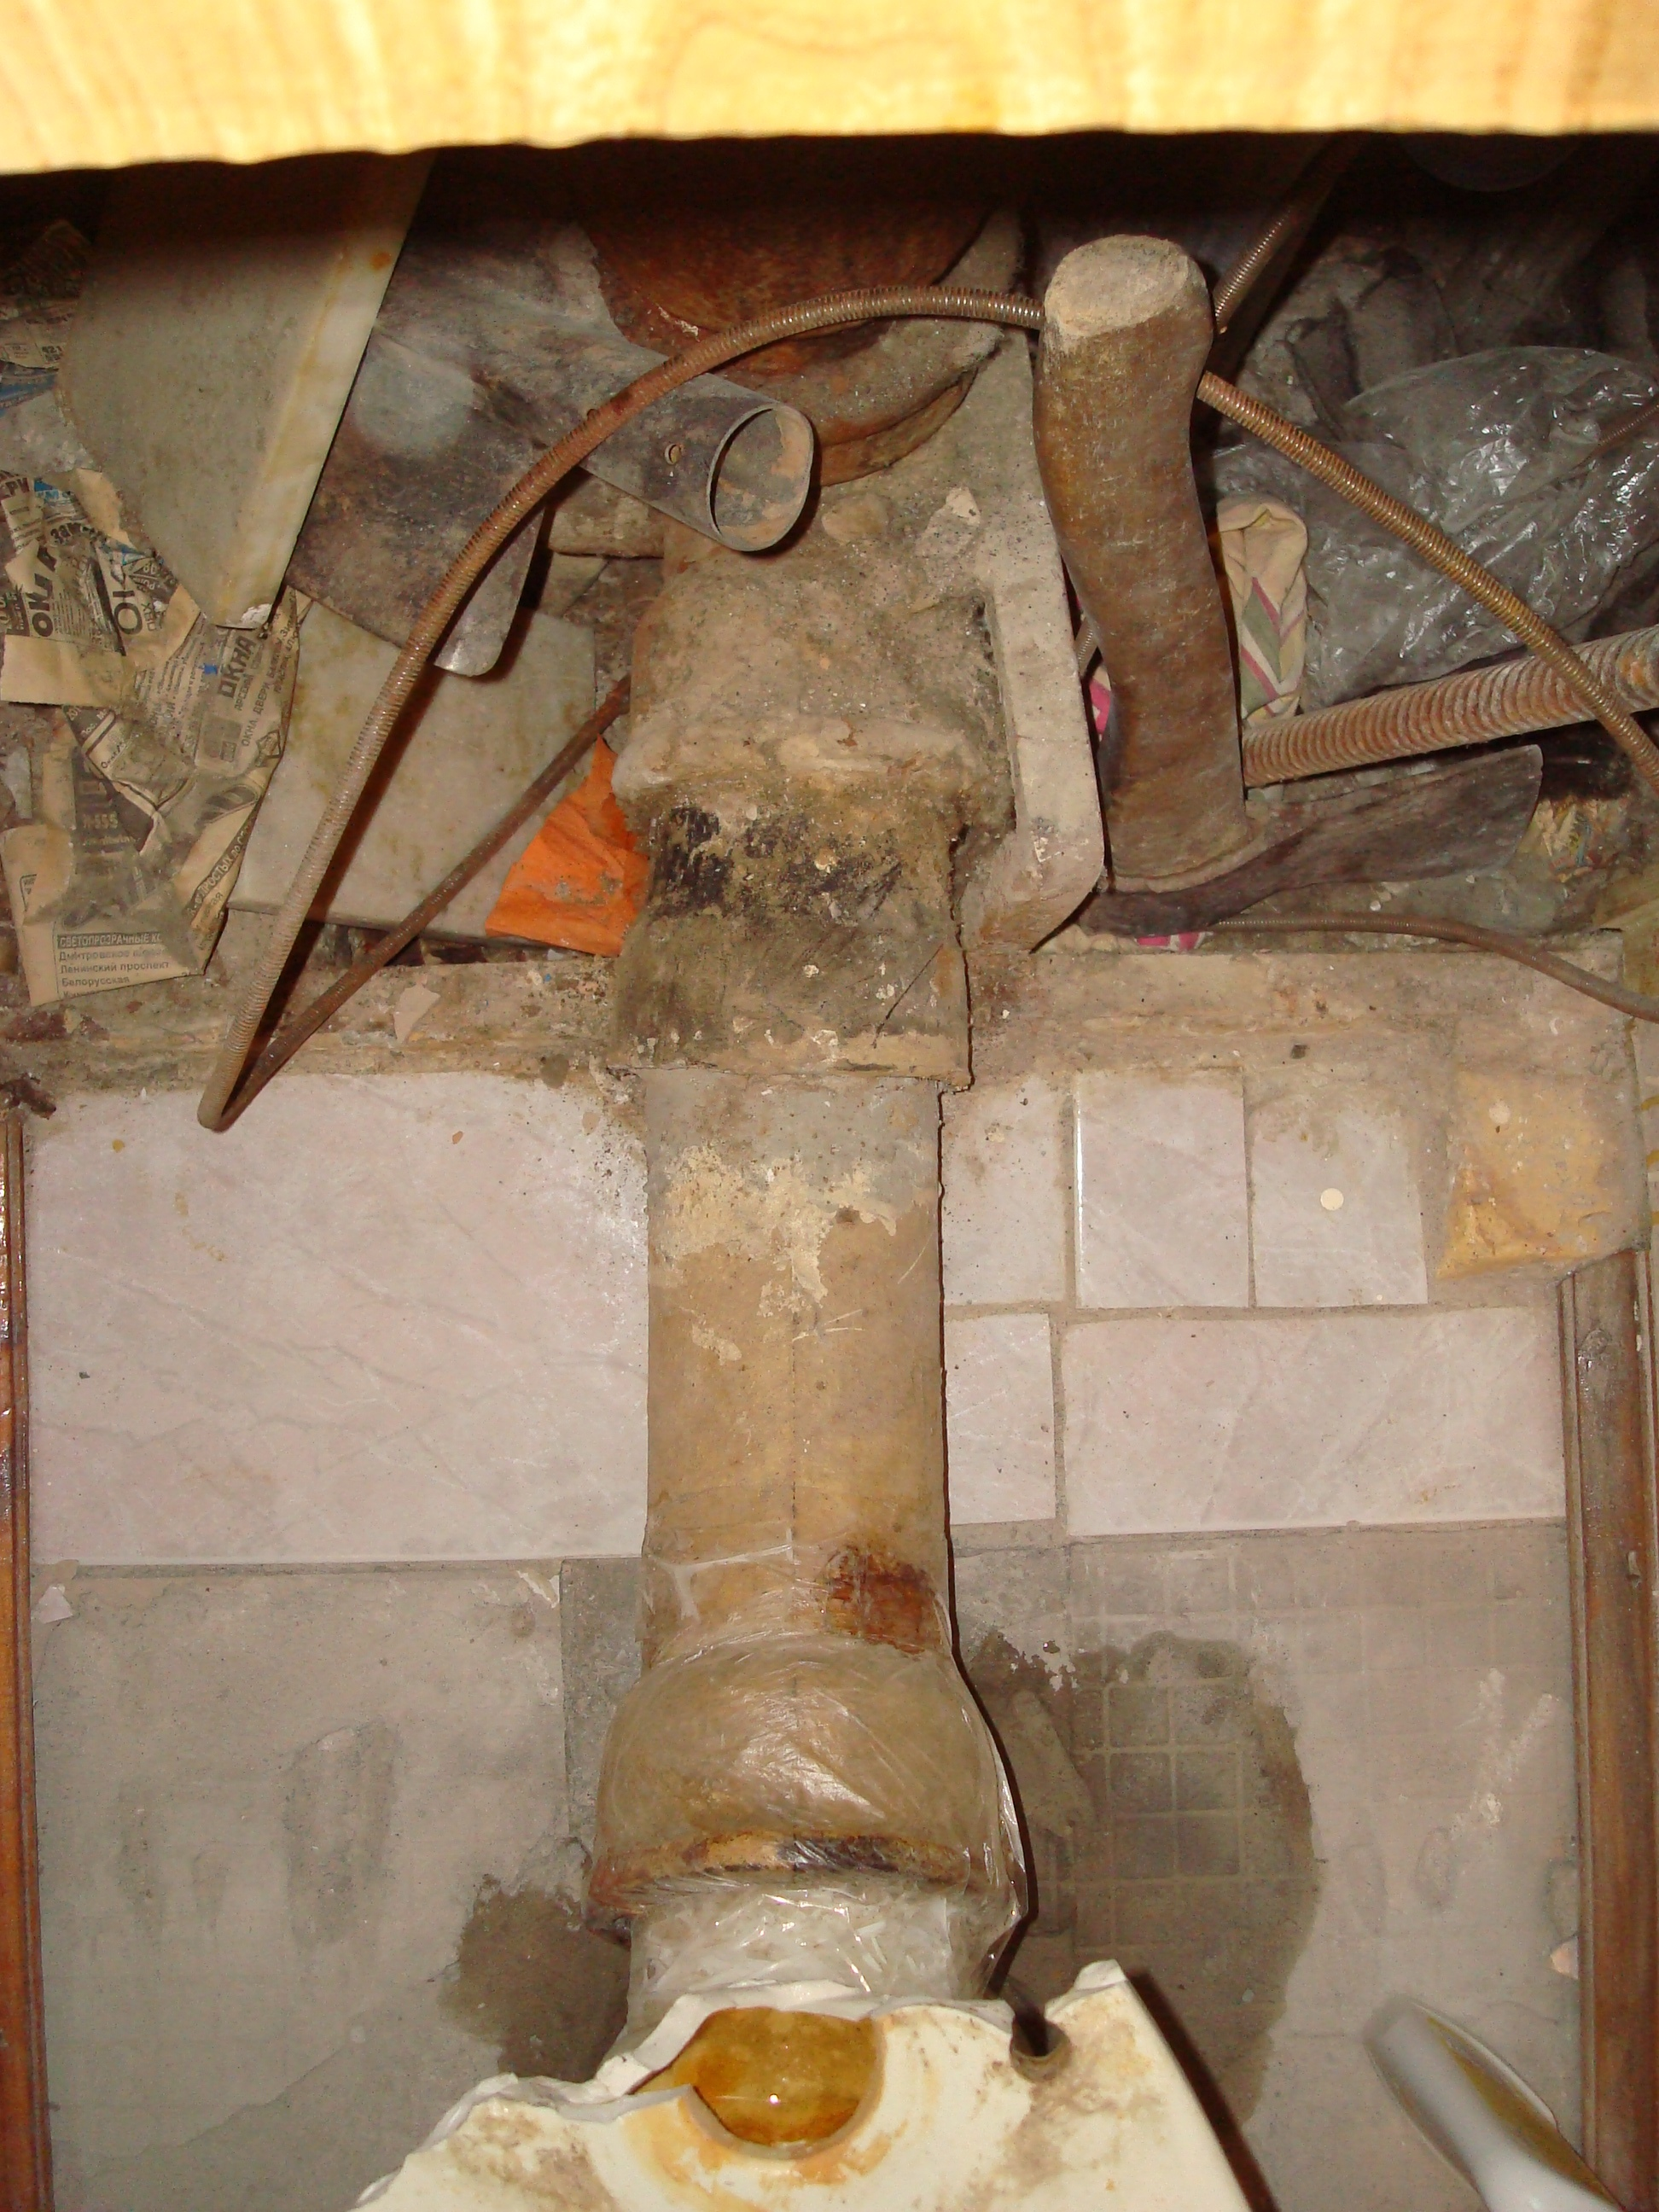 инструкция по установки унитаза dorff